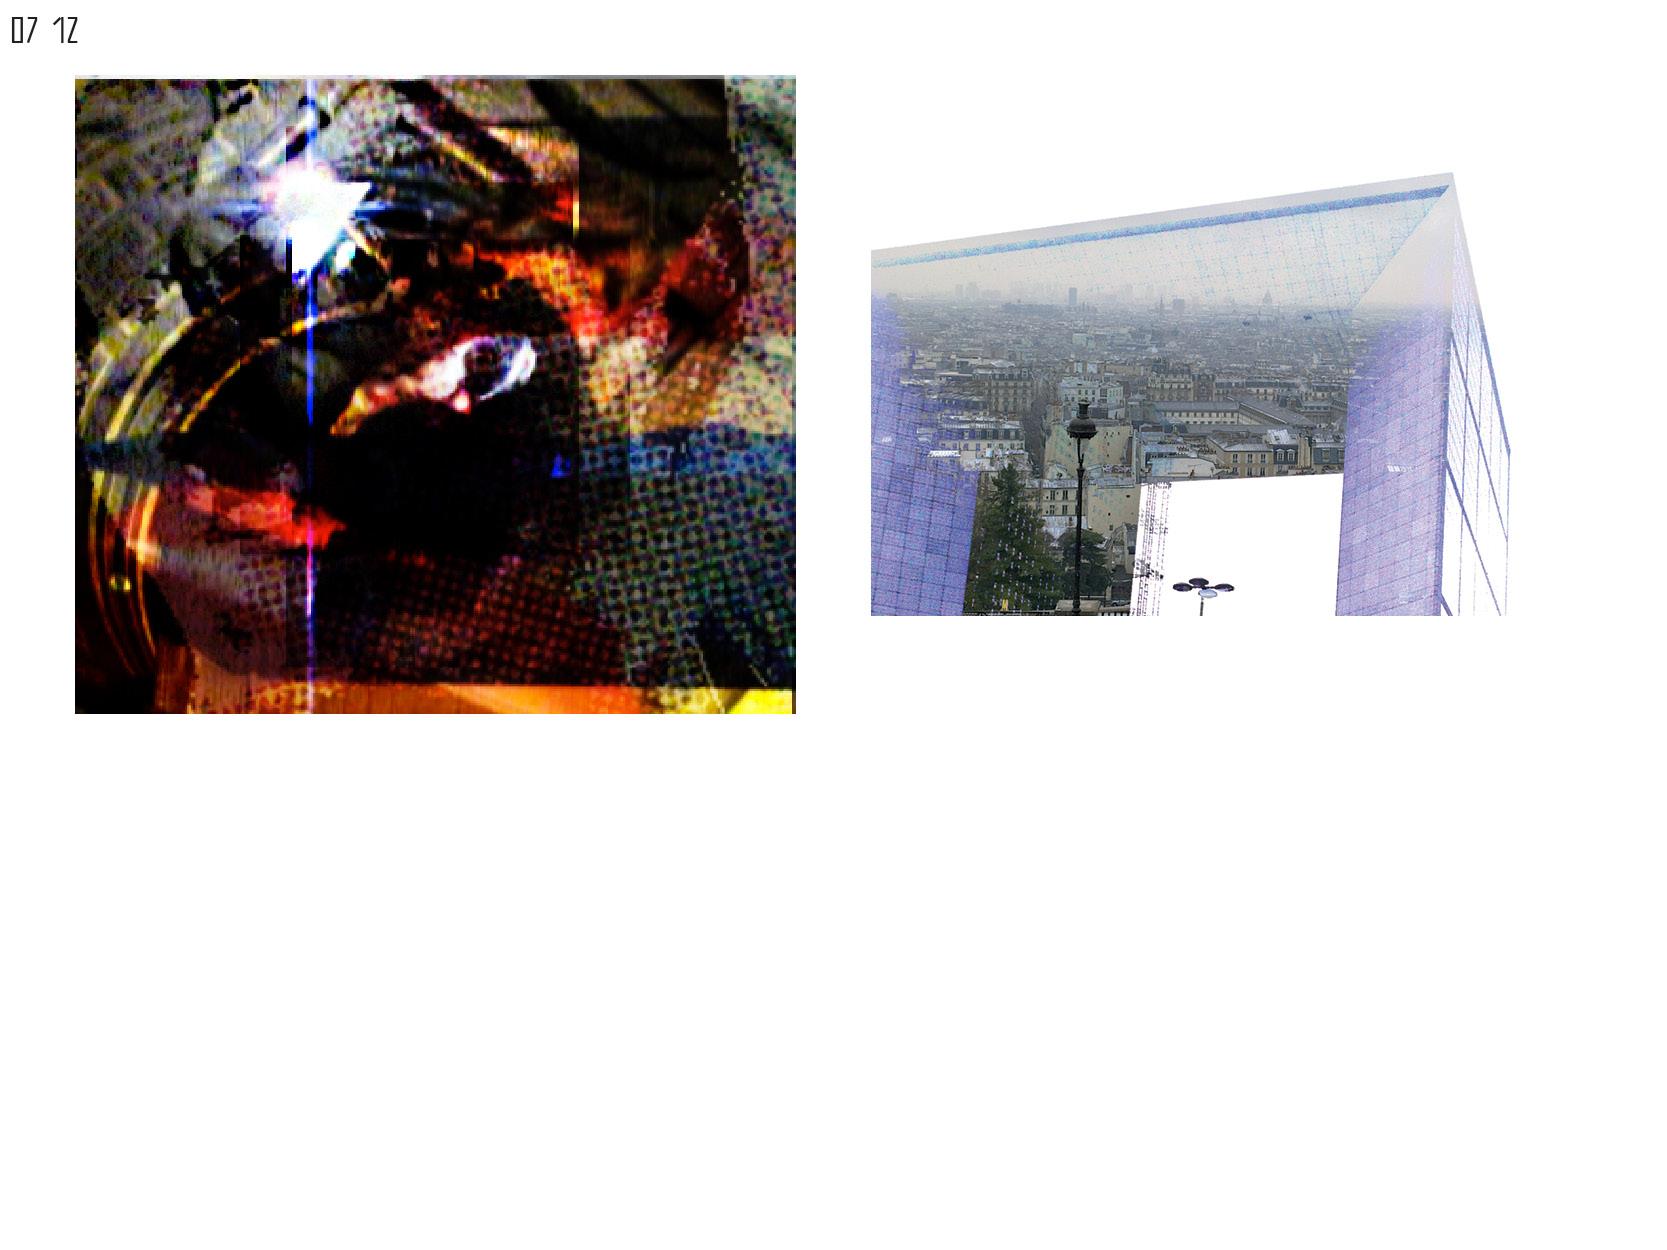 Gerrit-Schweiger-Dialog-Städte-Paris-Berlin-Jessica-Blank-Experiment-Fotoserie-Tagebuch-visuelle-Kommunikation-48